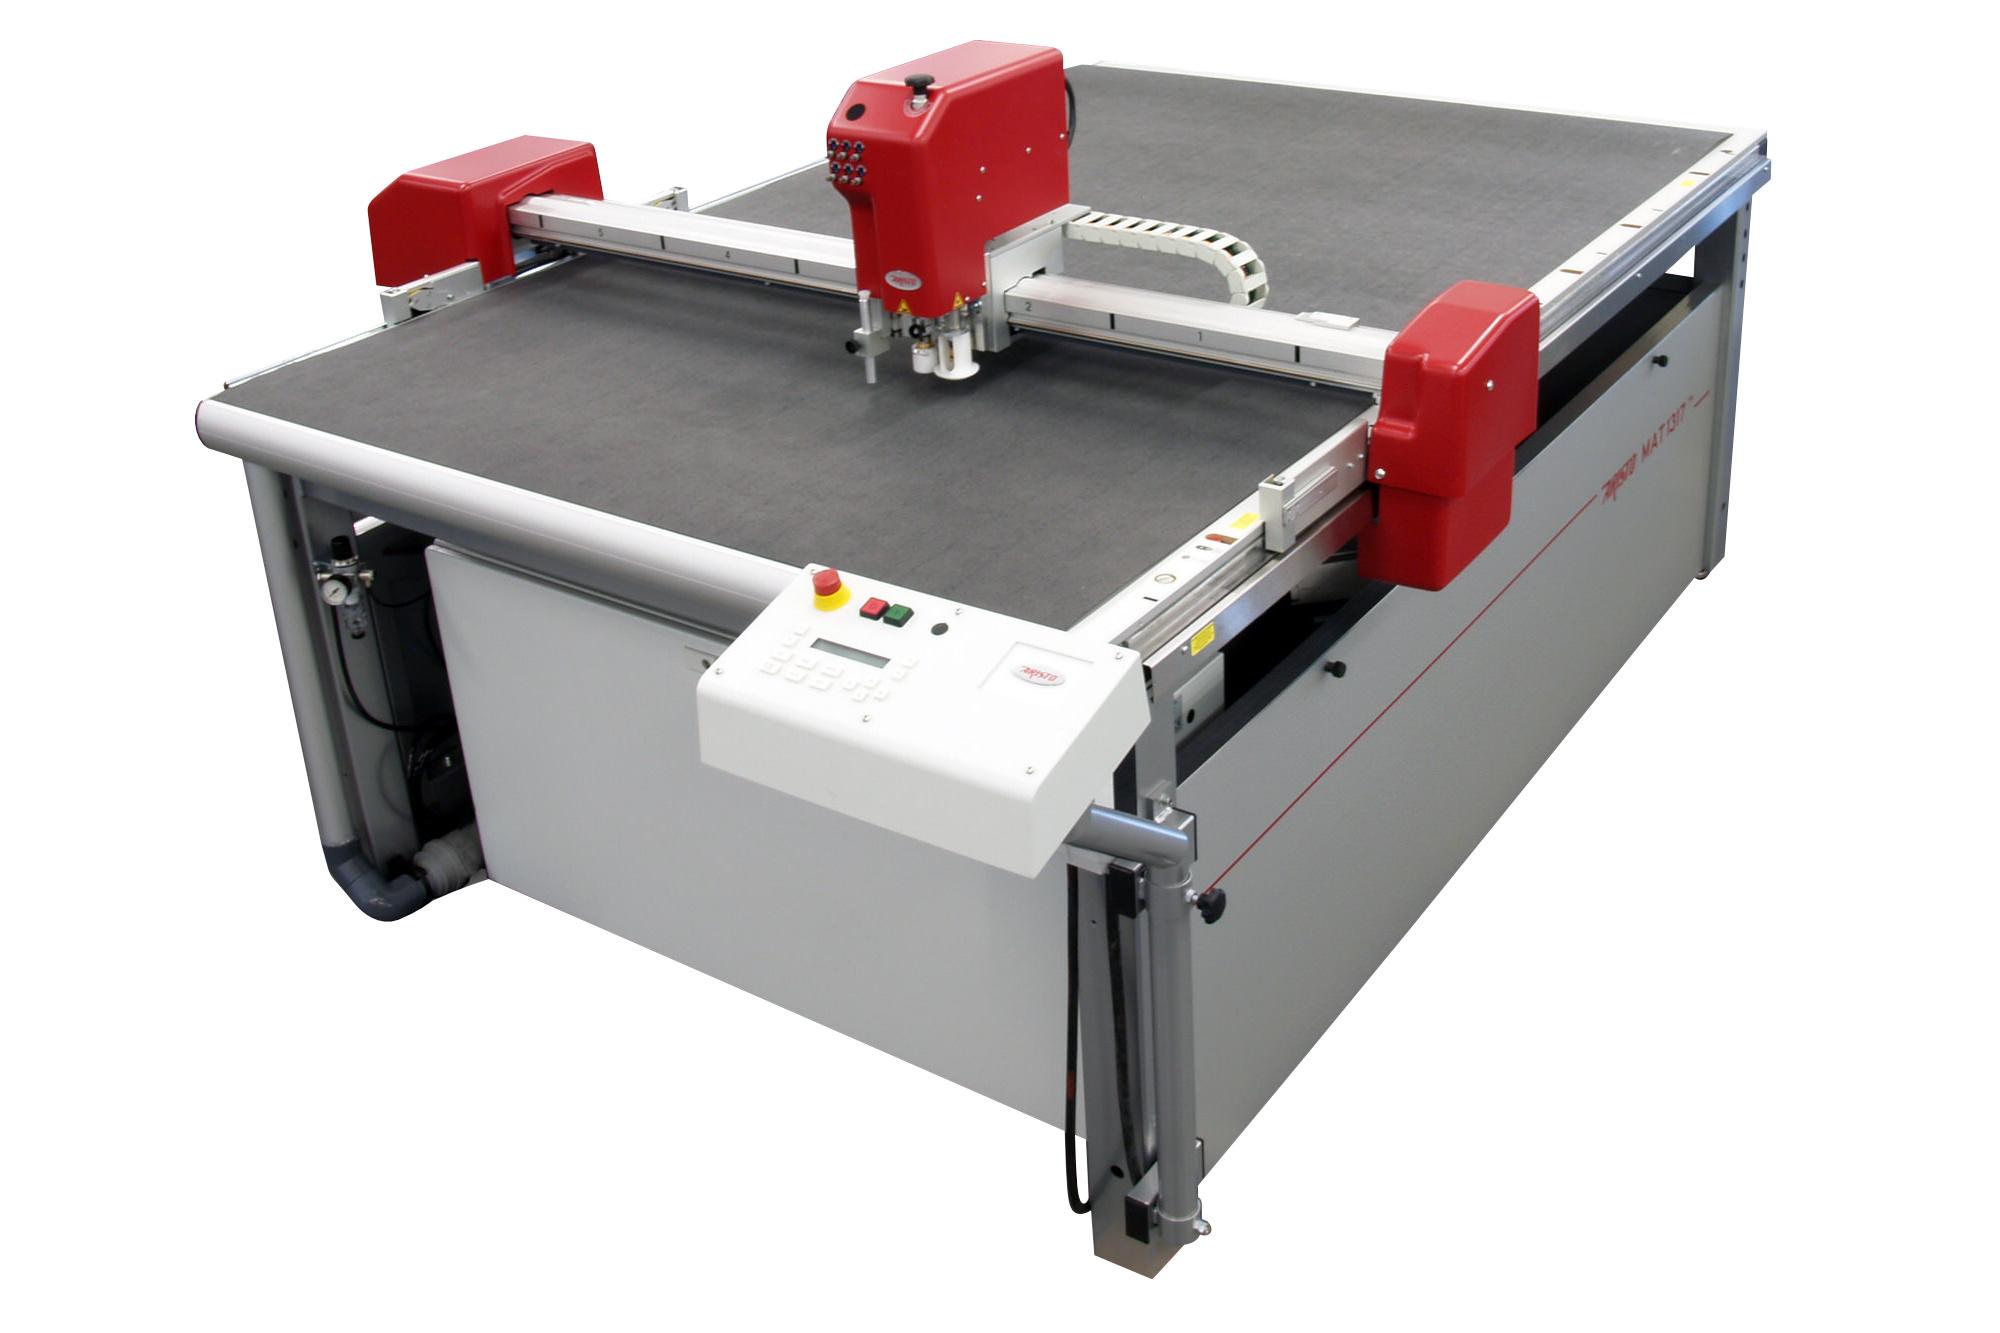 ARISTO ARISTOMAT SL Universal Cutter